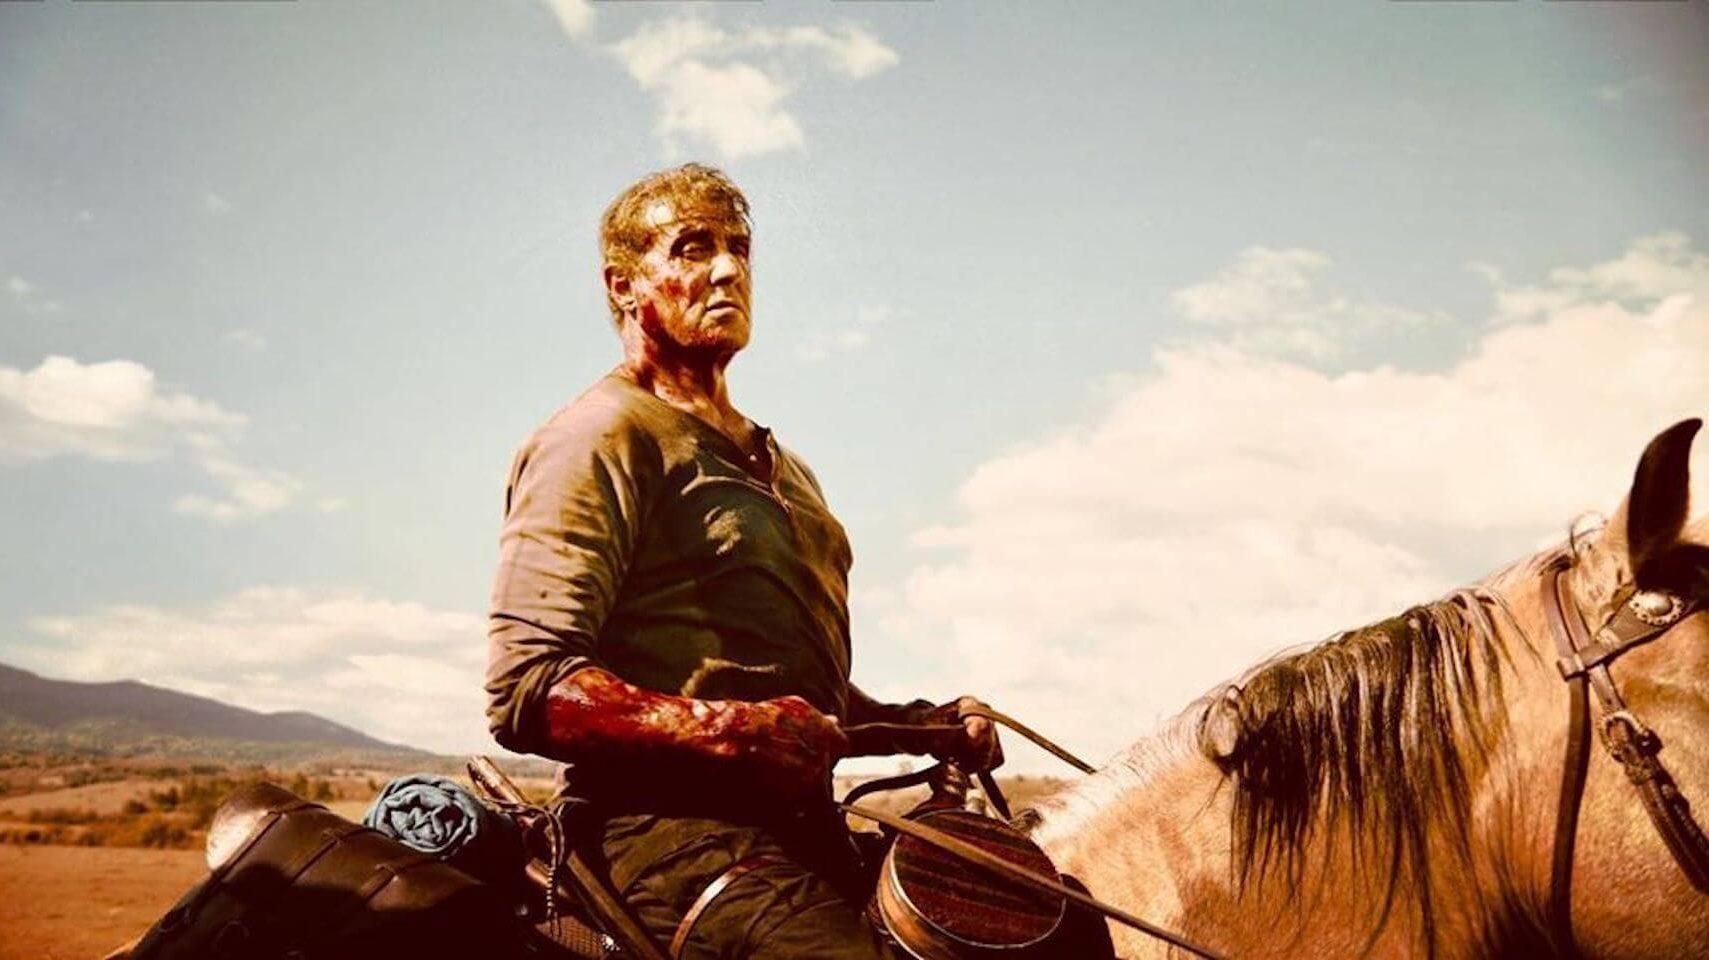 خالق شخصیت رمبو، فیلم Rambo: Last Blood را تحقیرآمیز توصیف کرد